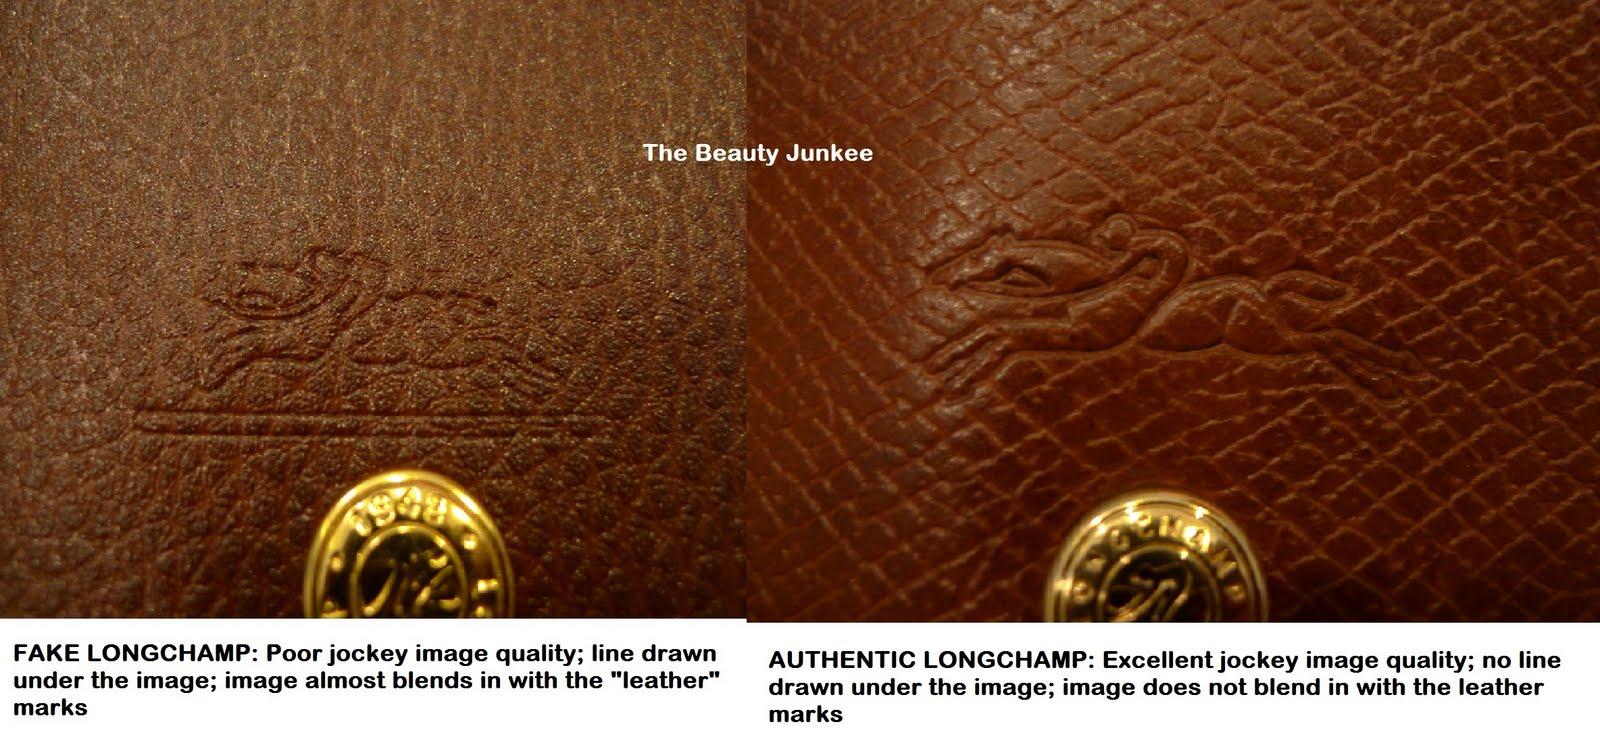 replica prada tote bags - INSPECTING A FAKE LONGCHAMP LE PLIAGE | The Beauty Junkee